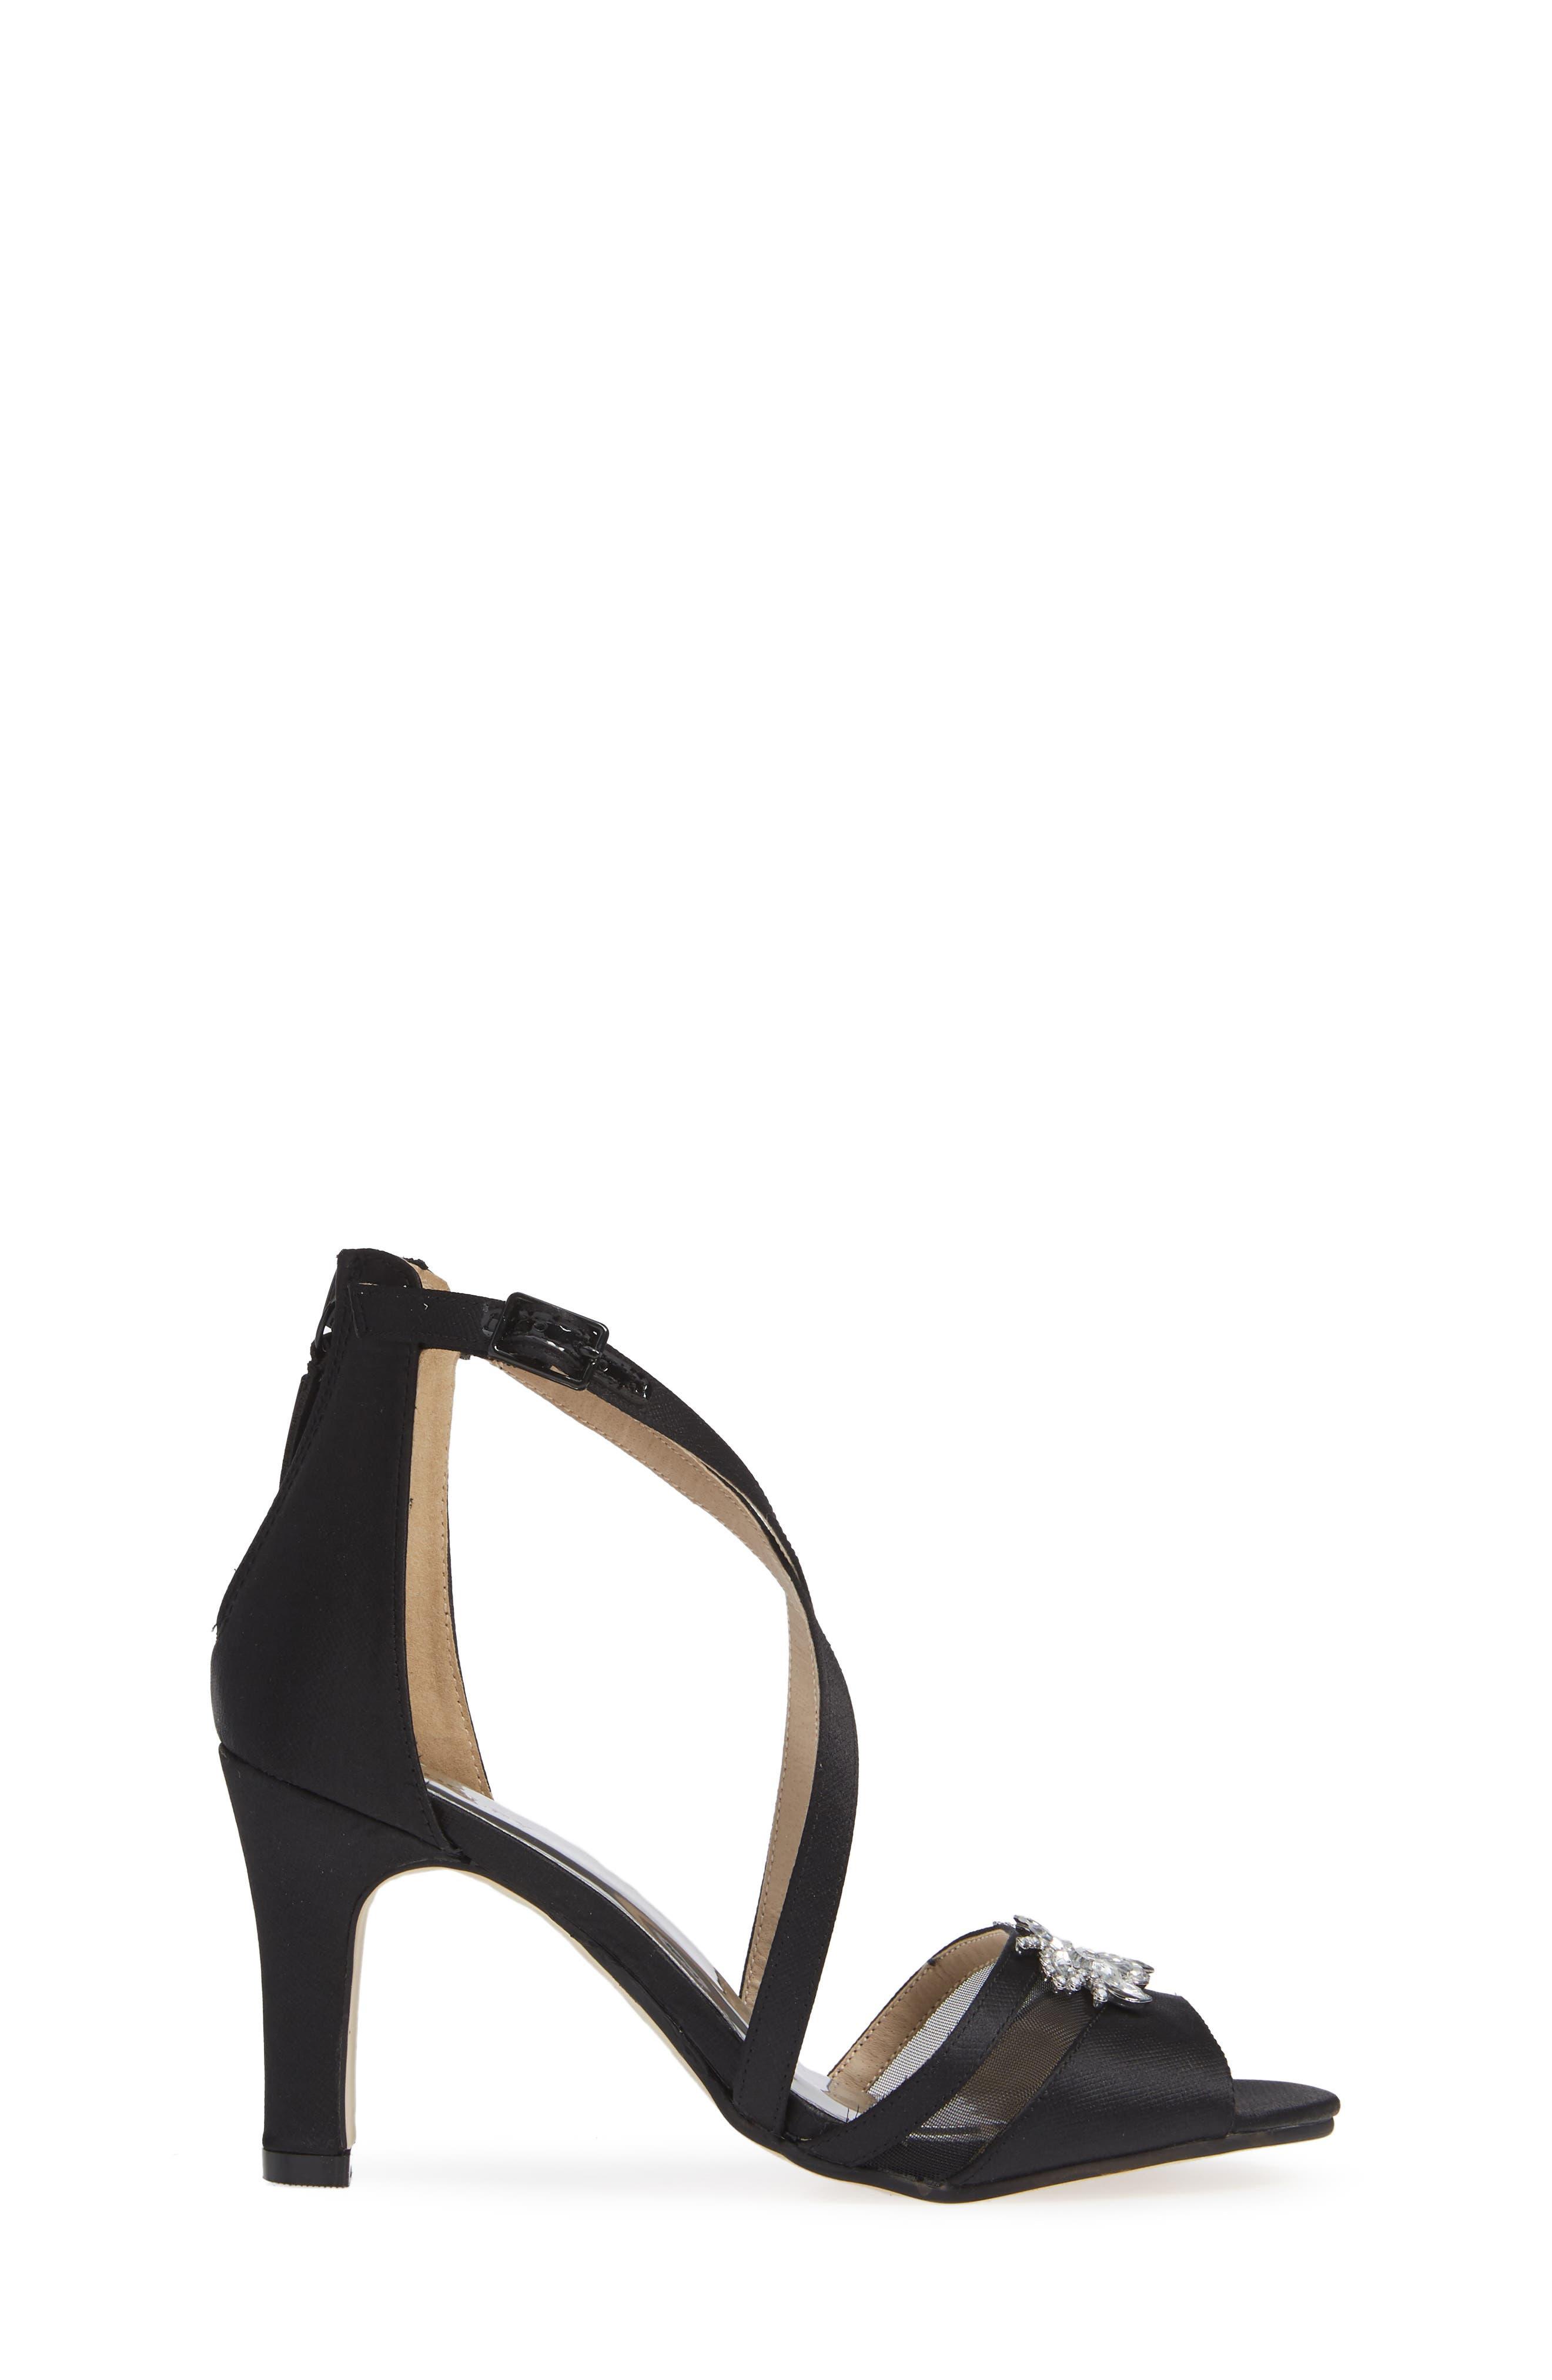 Badgley Mischka Kandall Hannah Embellished Cross Strap Sandal,                             Alternate thumbnail 3, color,                             BLACK SATIN